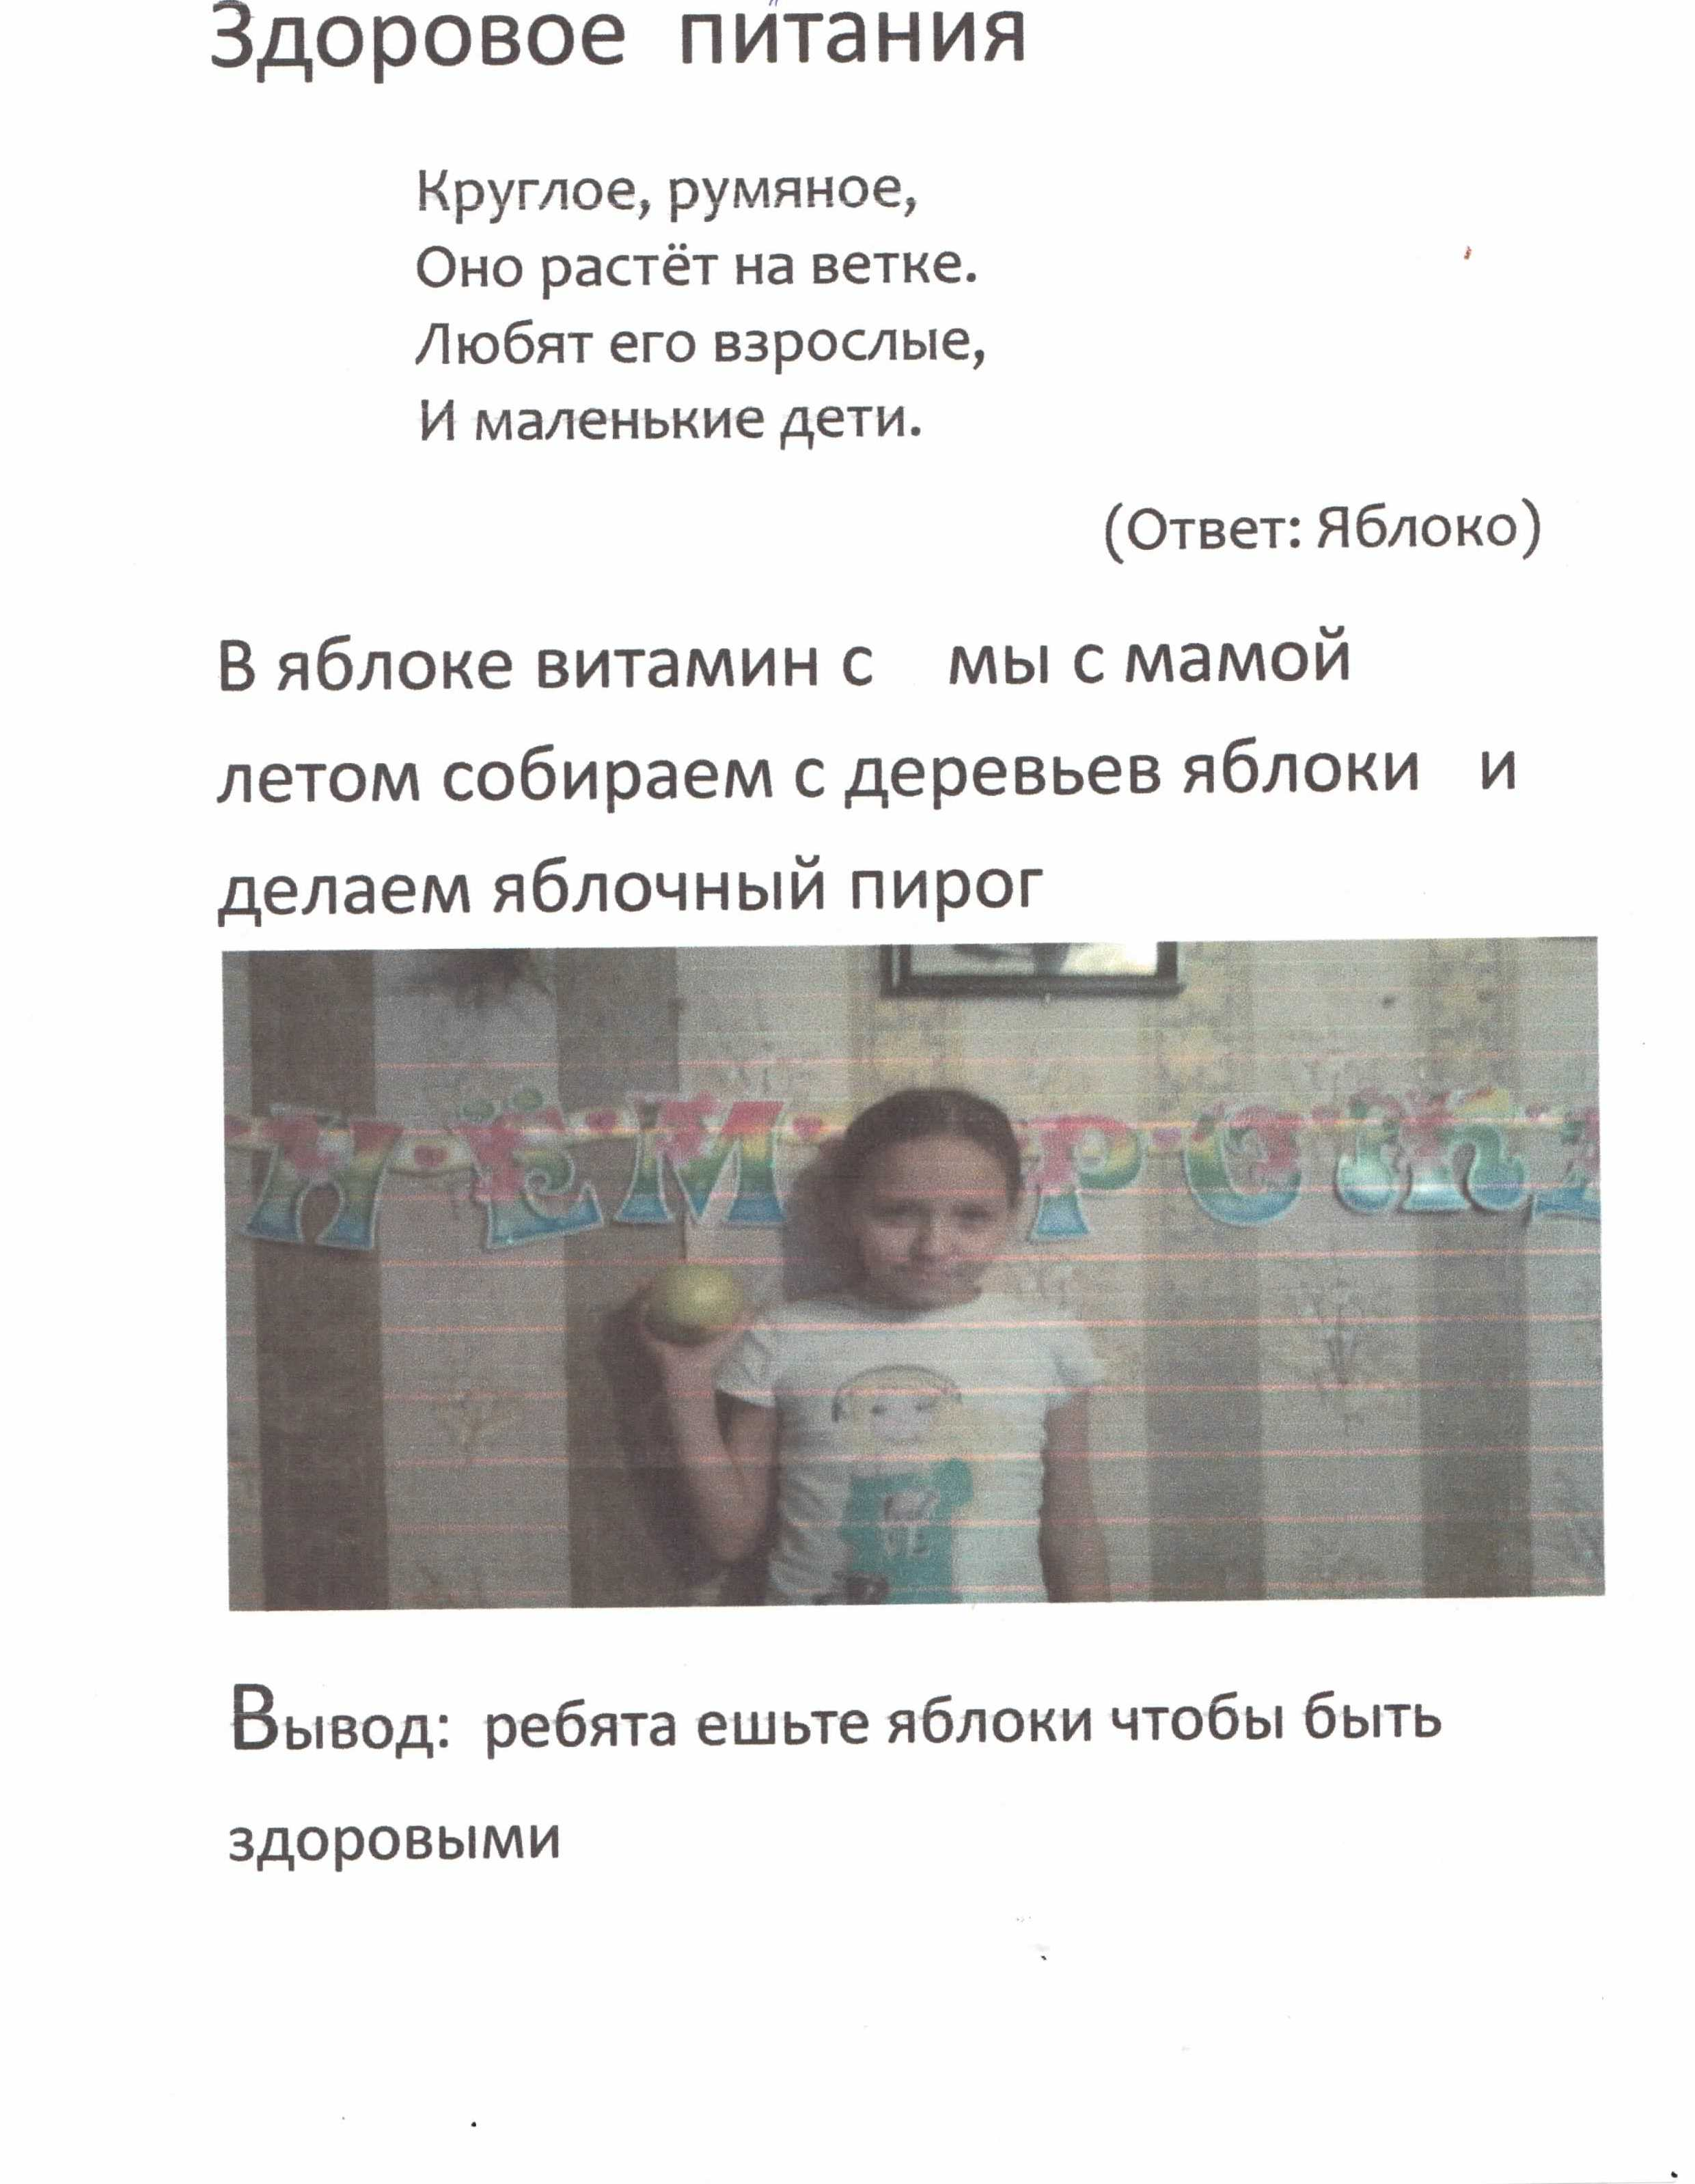 C:\Users\Татьяна\Desktop\питание\_20150120_17045807.jpg